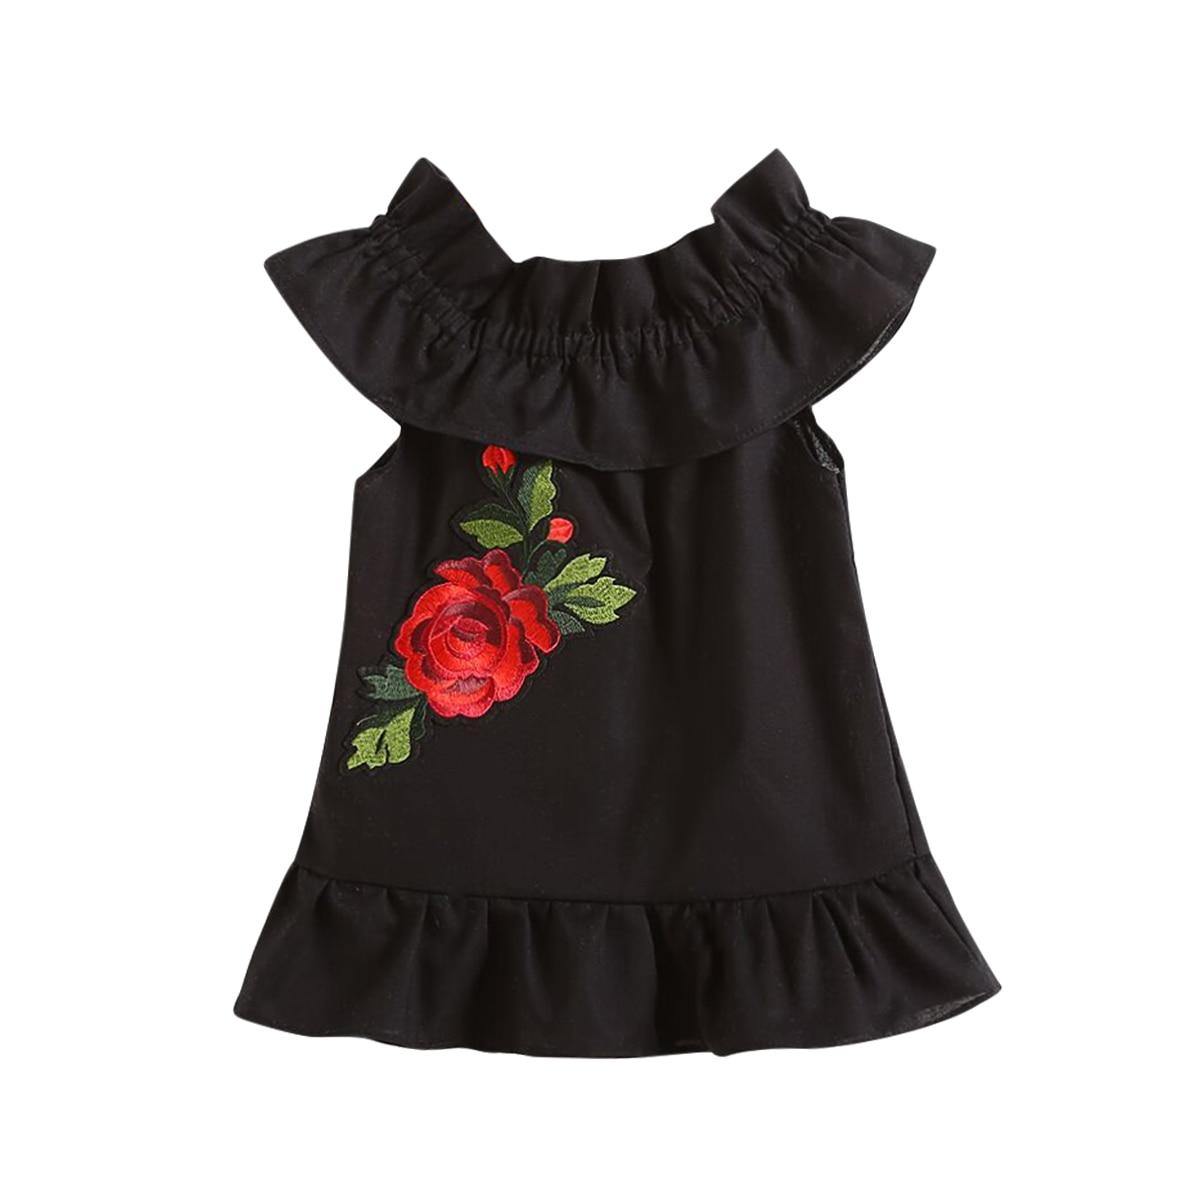 Sweet Newborn Infant Baby Girl Clothes Flower Short Sleeve Dresses Summer Dress Sundress